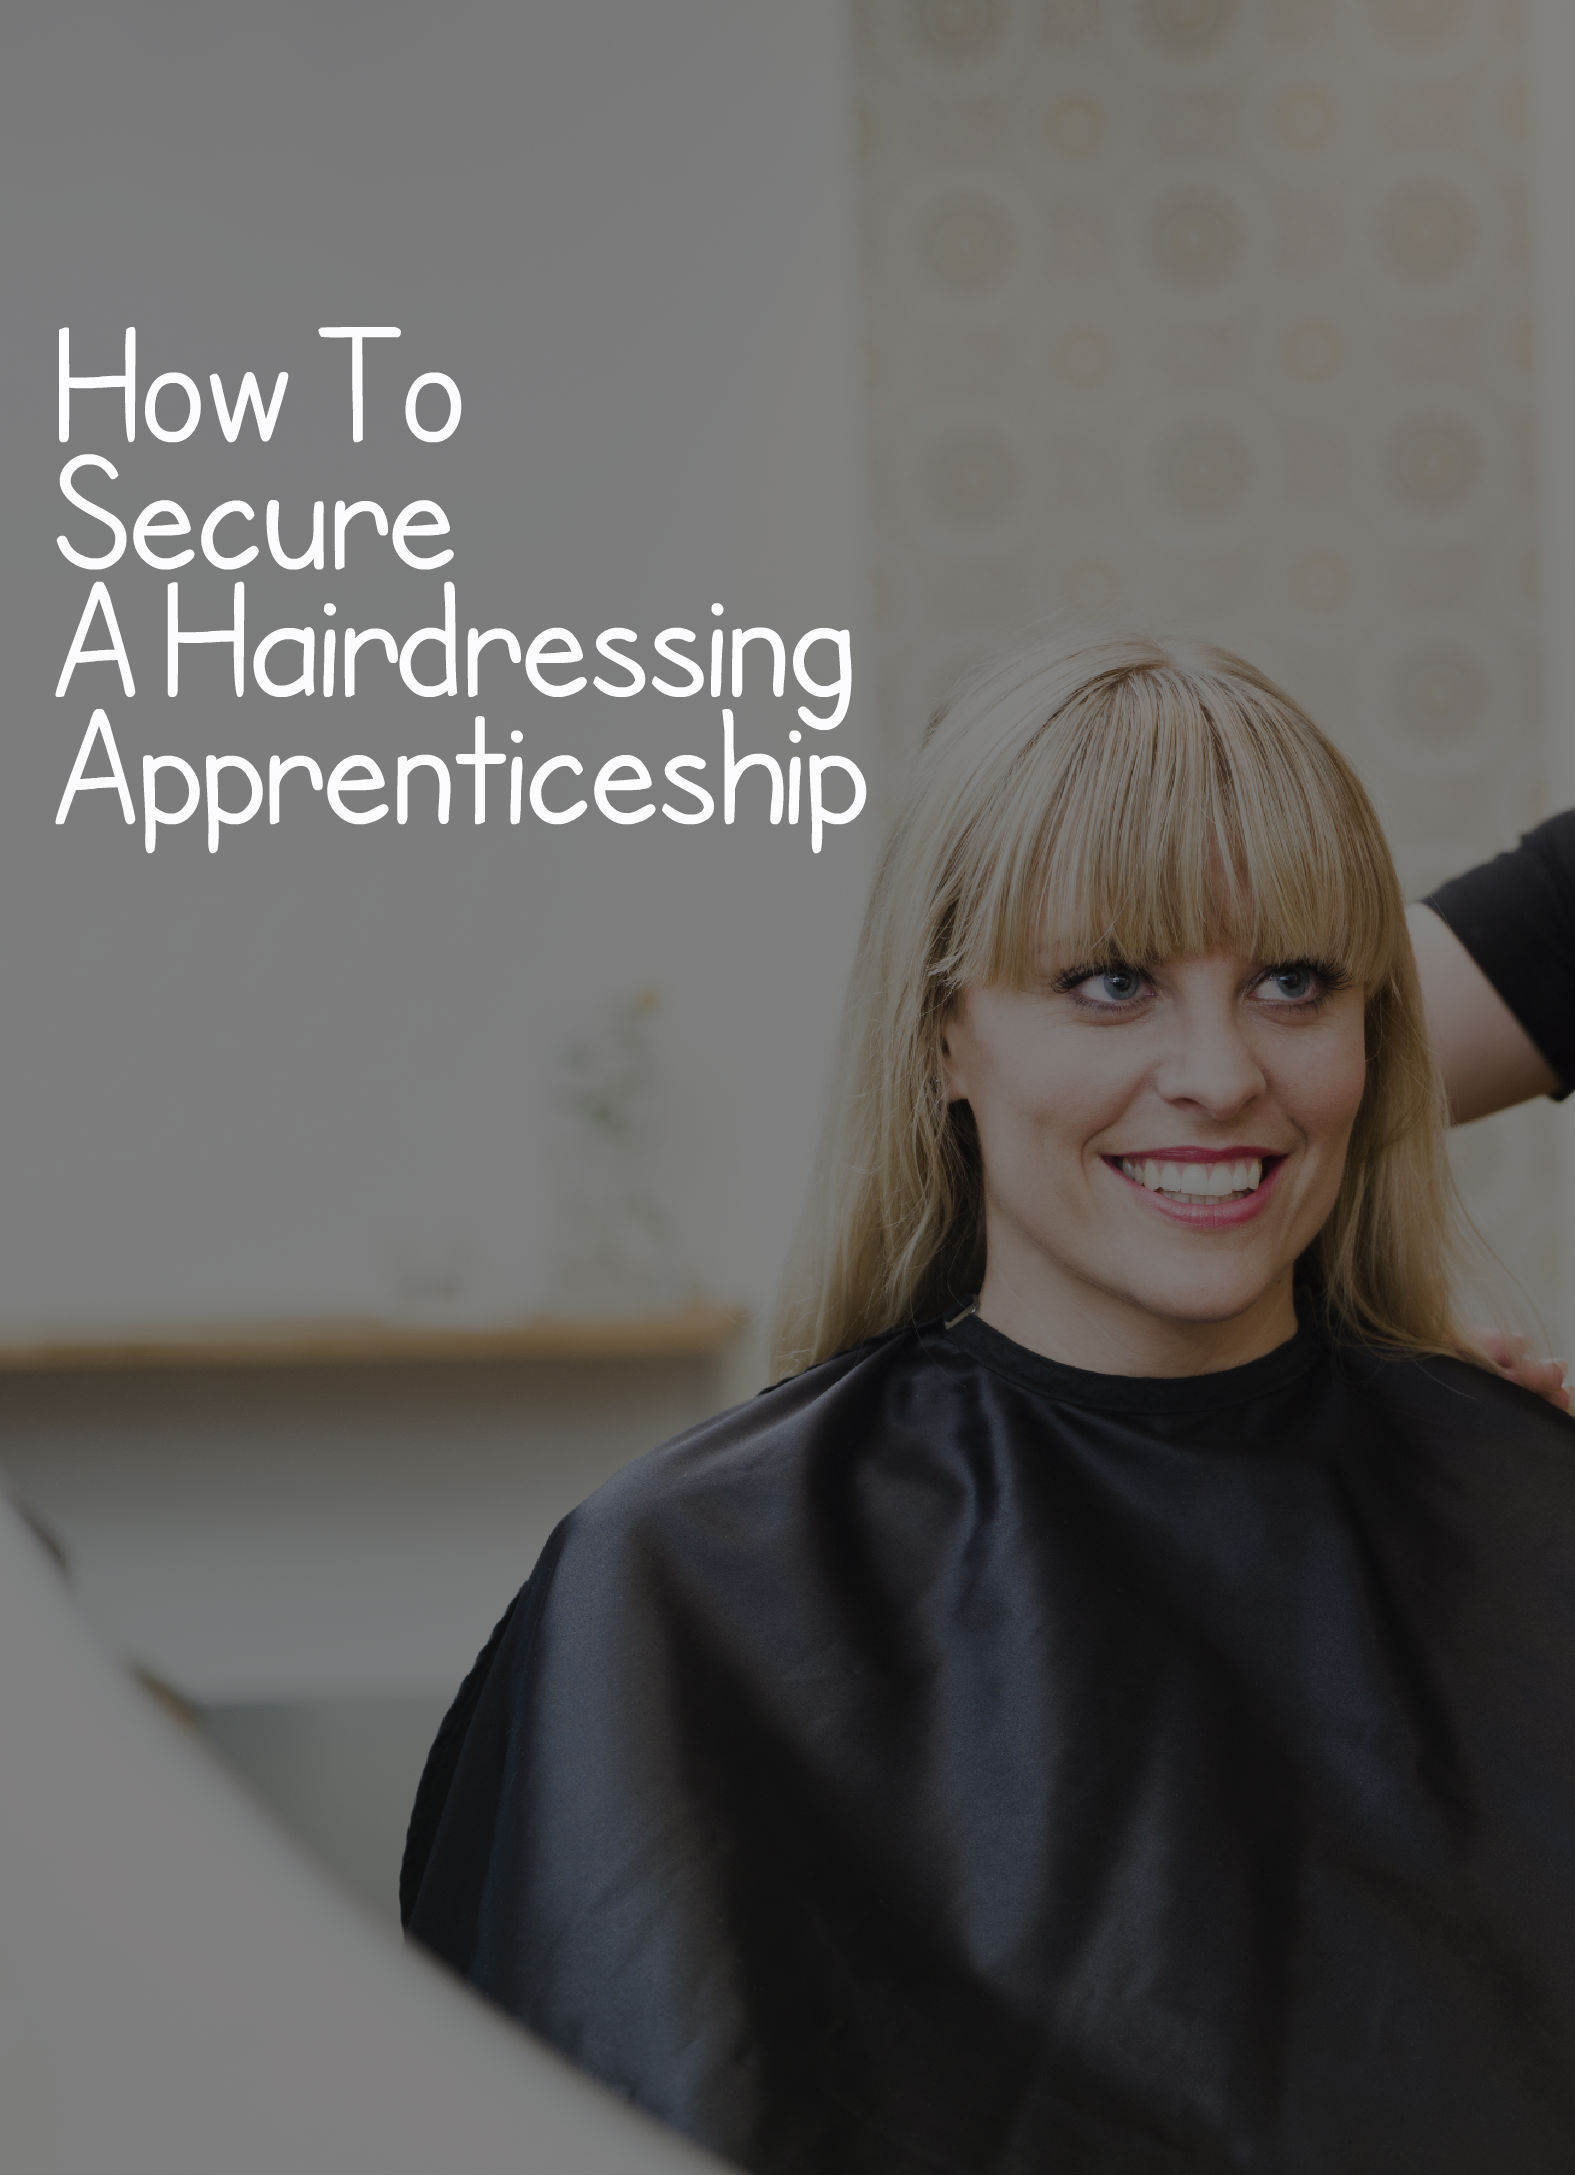 1st year apprentice hairdressing resume